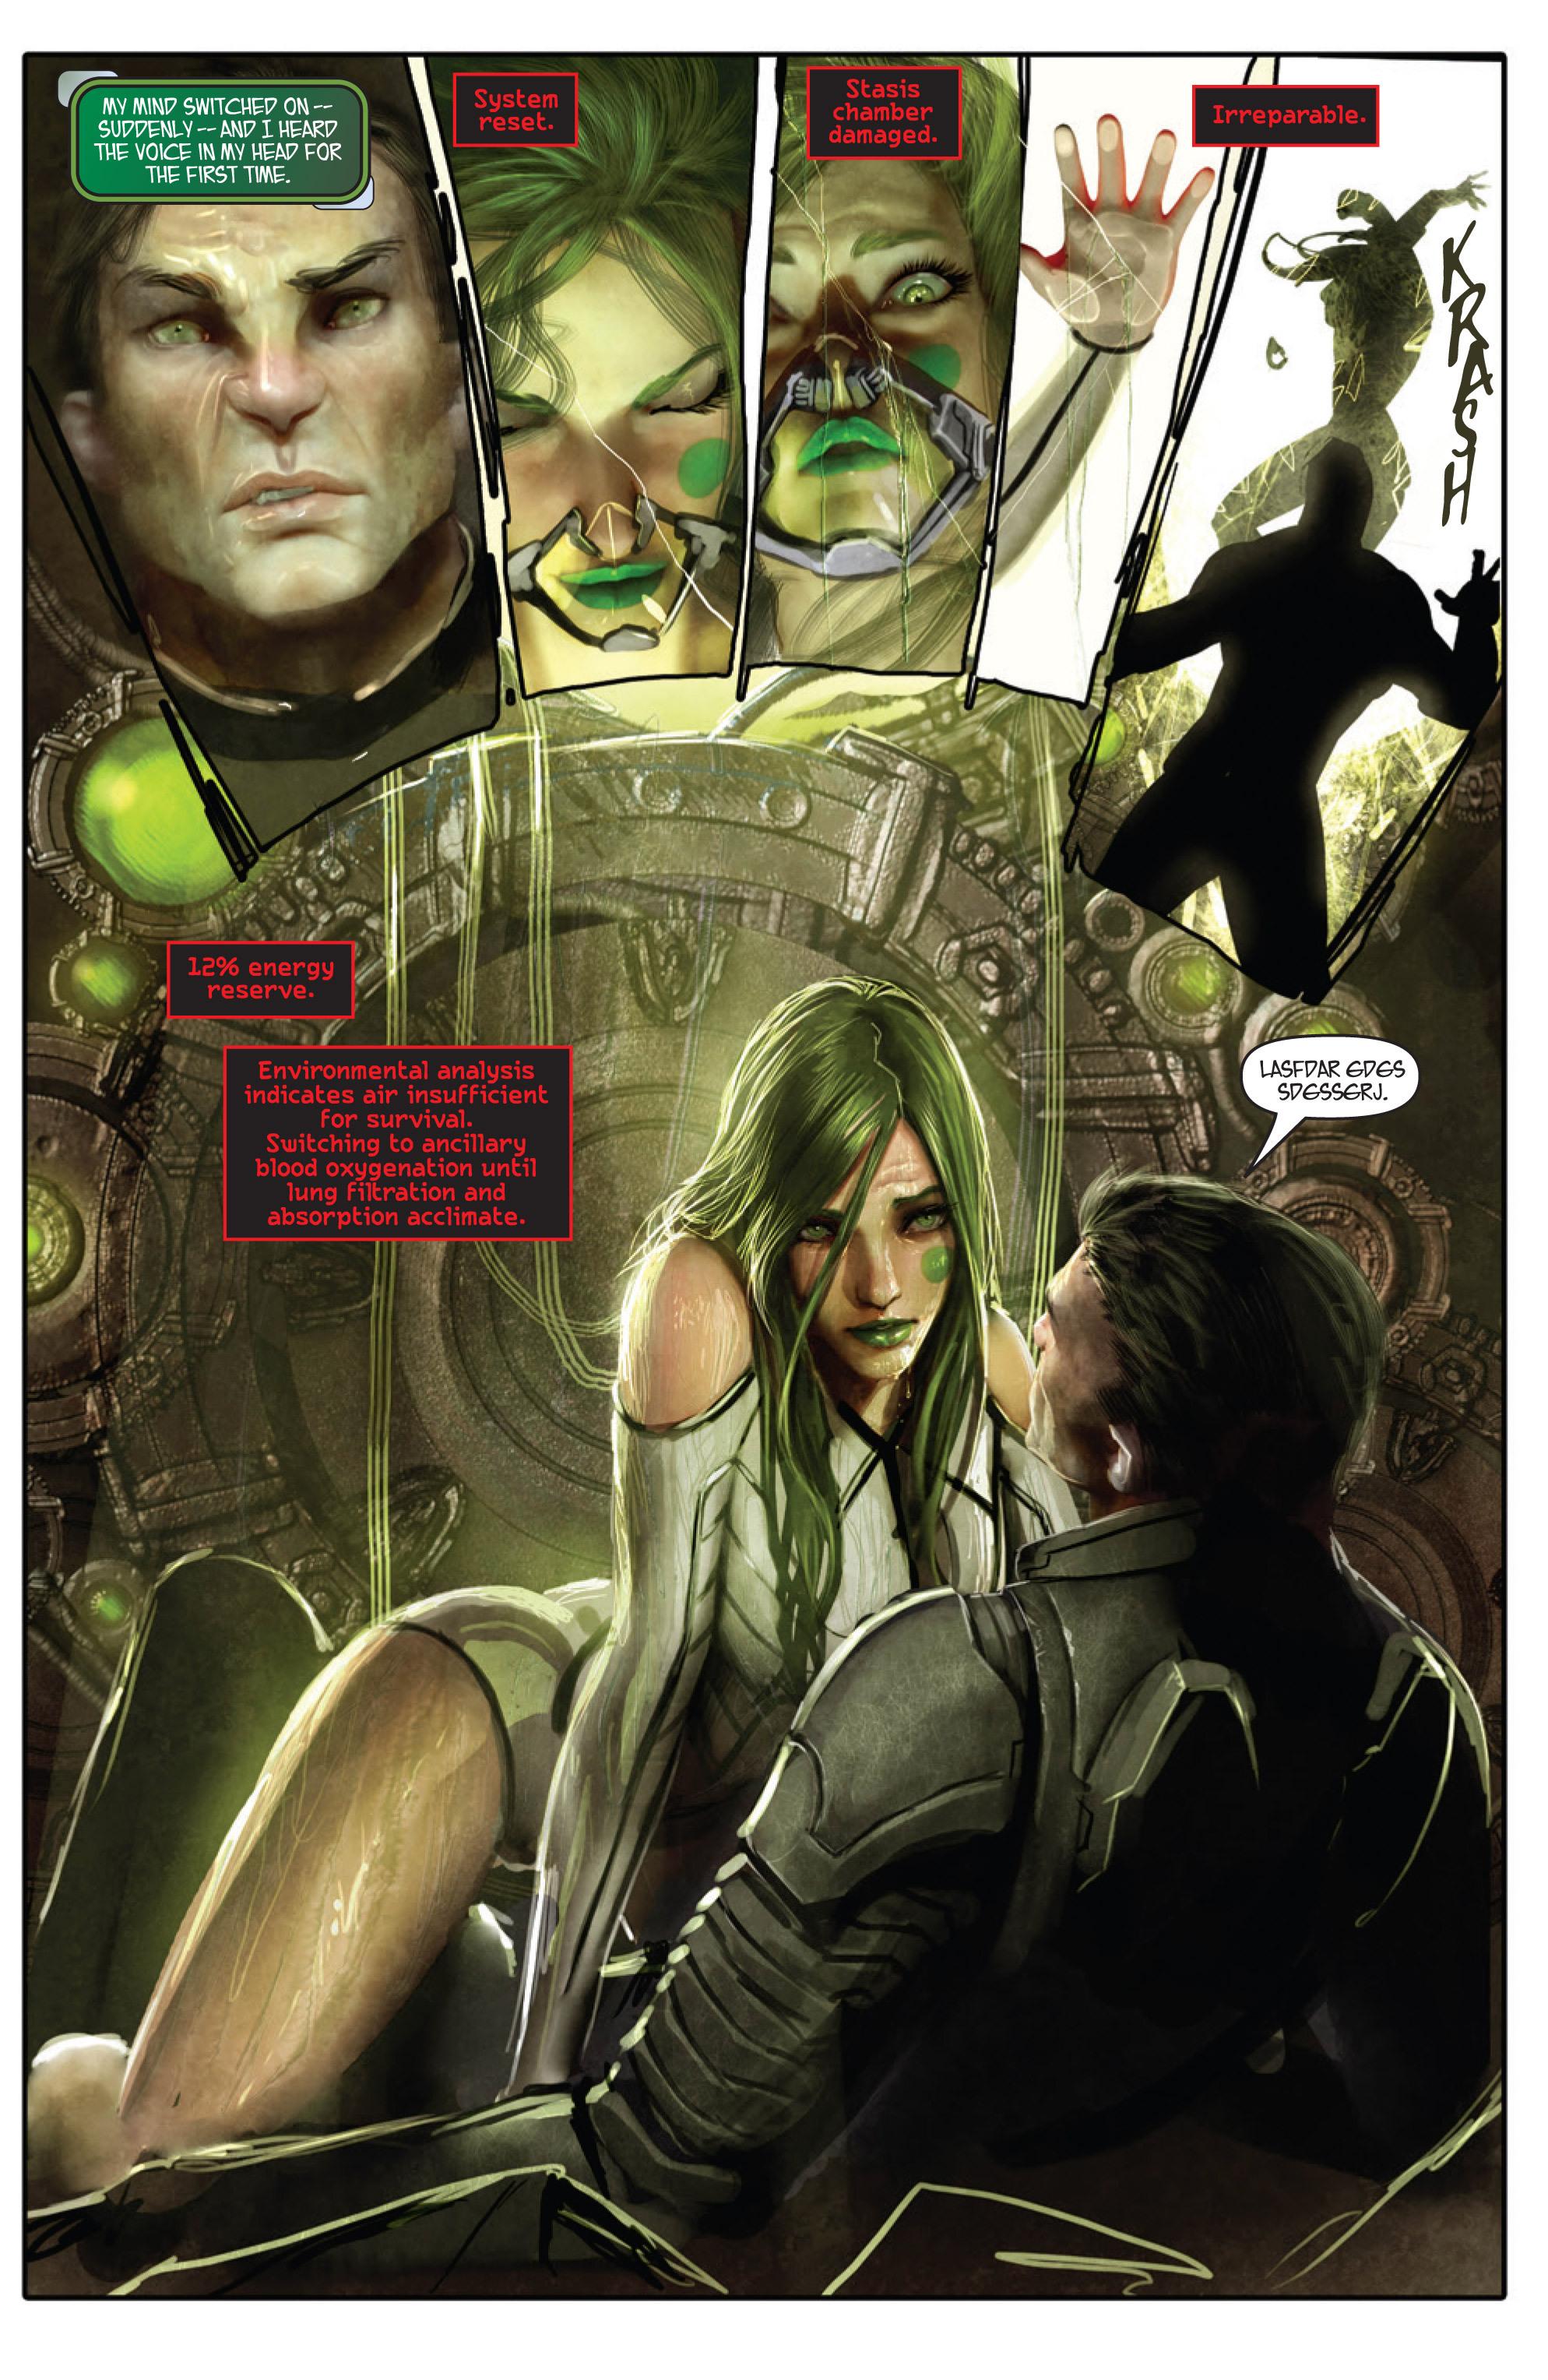 Read online Aphrodite IX (2013) comic -  Issue #Aphrodite IX (2013) _TPB 1 - 15